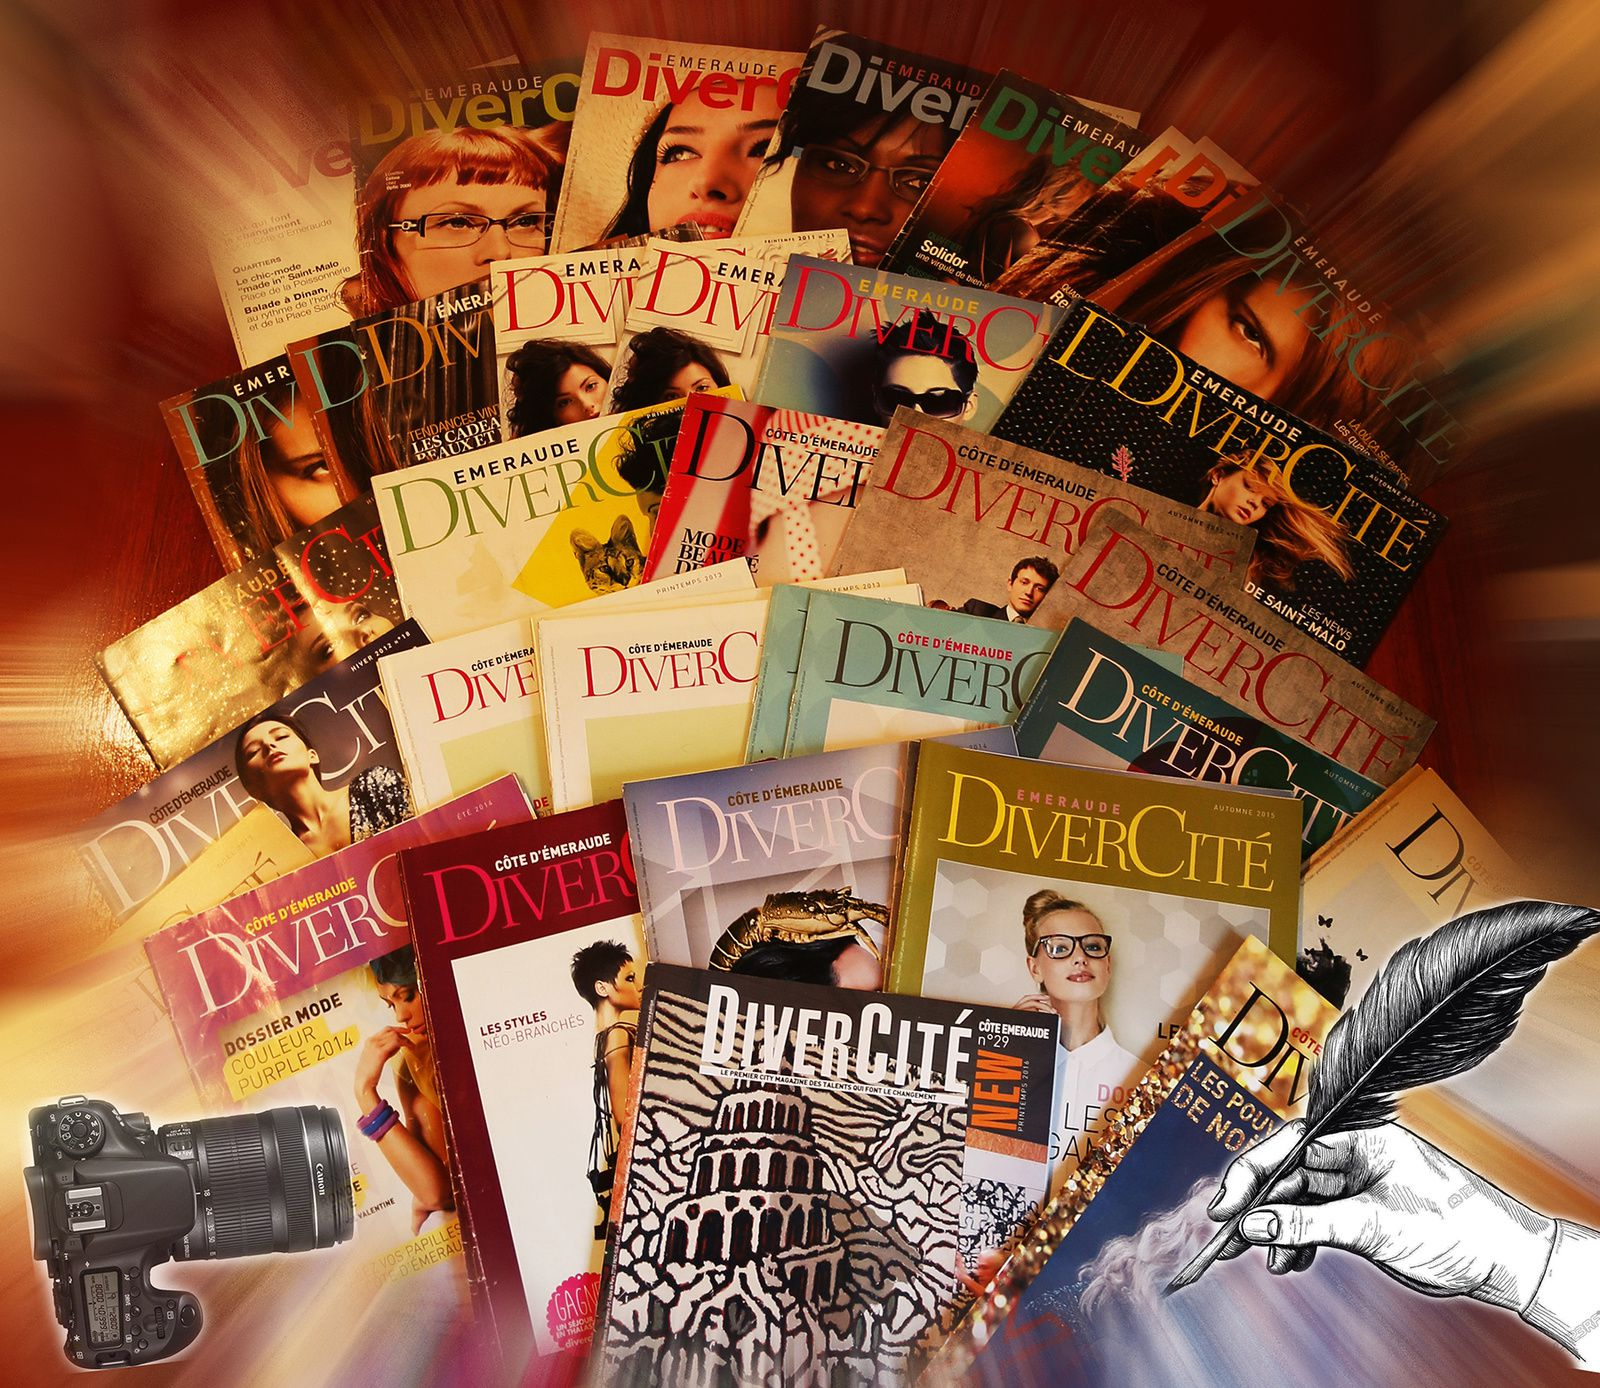 Magazine Divercite Cote d'Emeraude